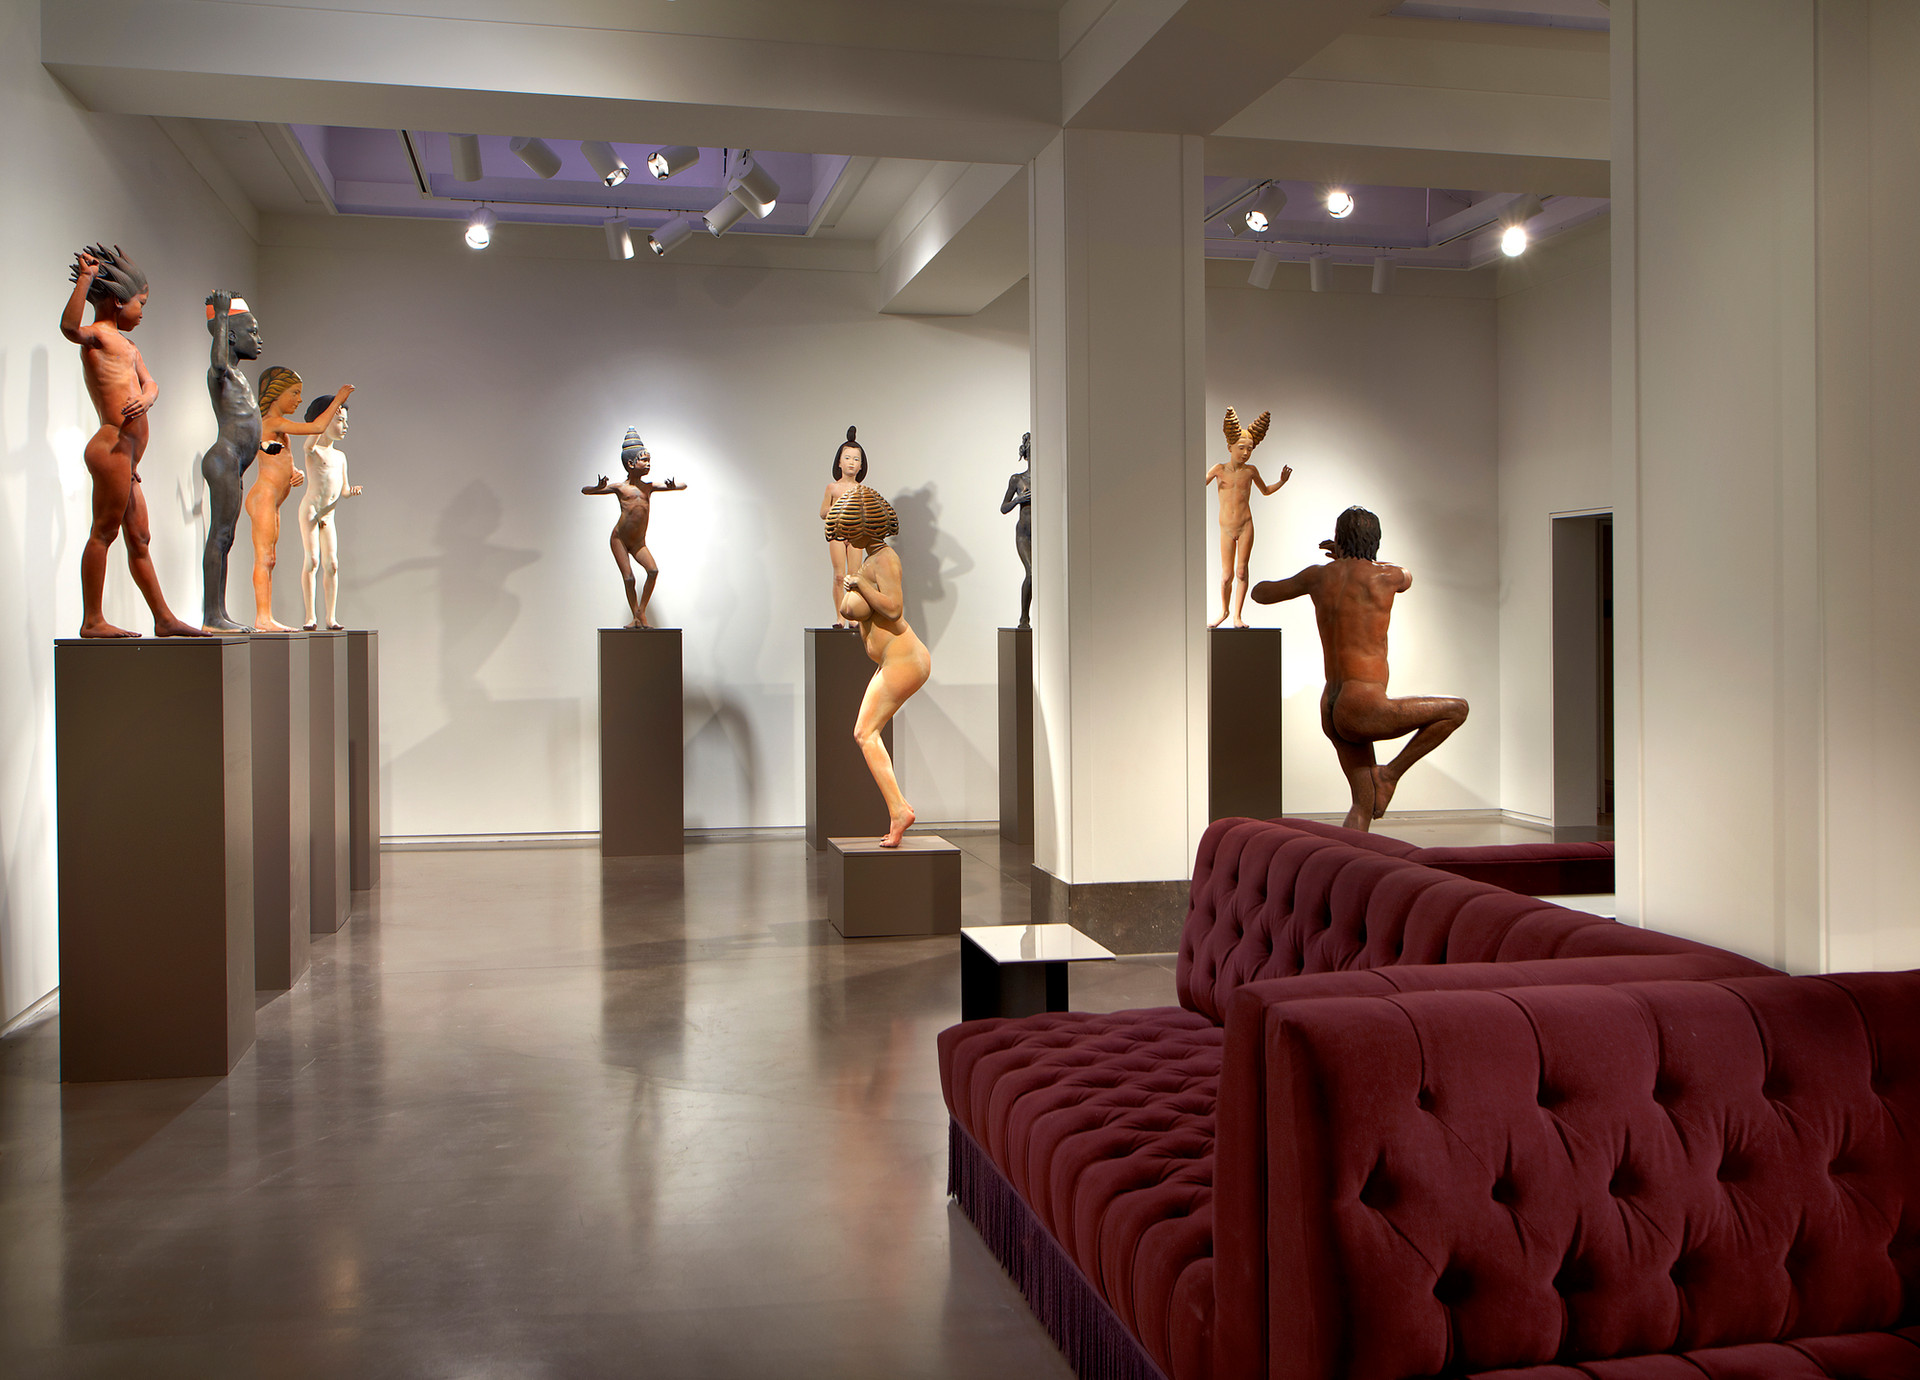 21c Cincinnati - Lobby Gallery